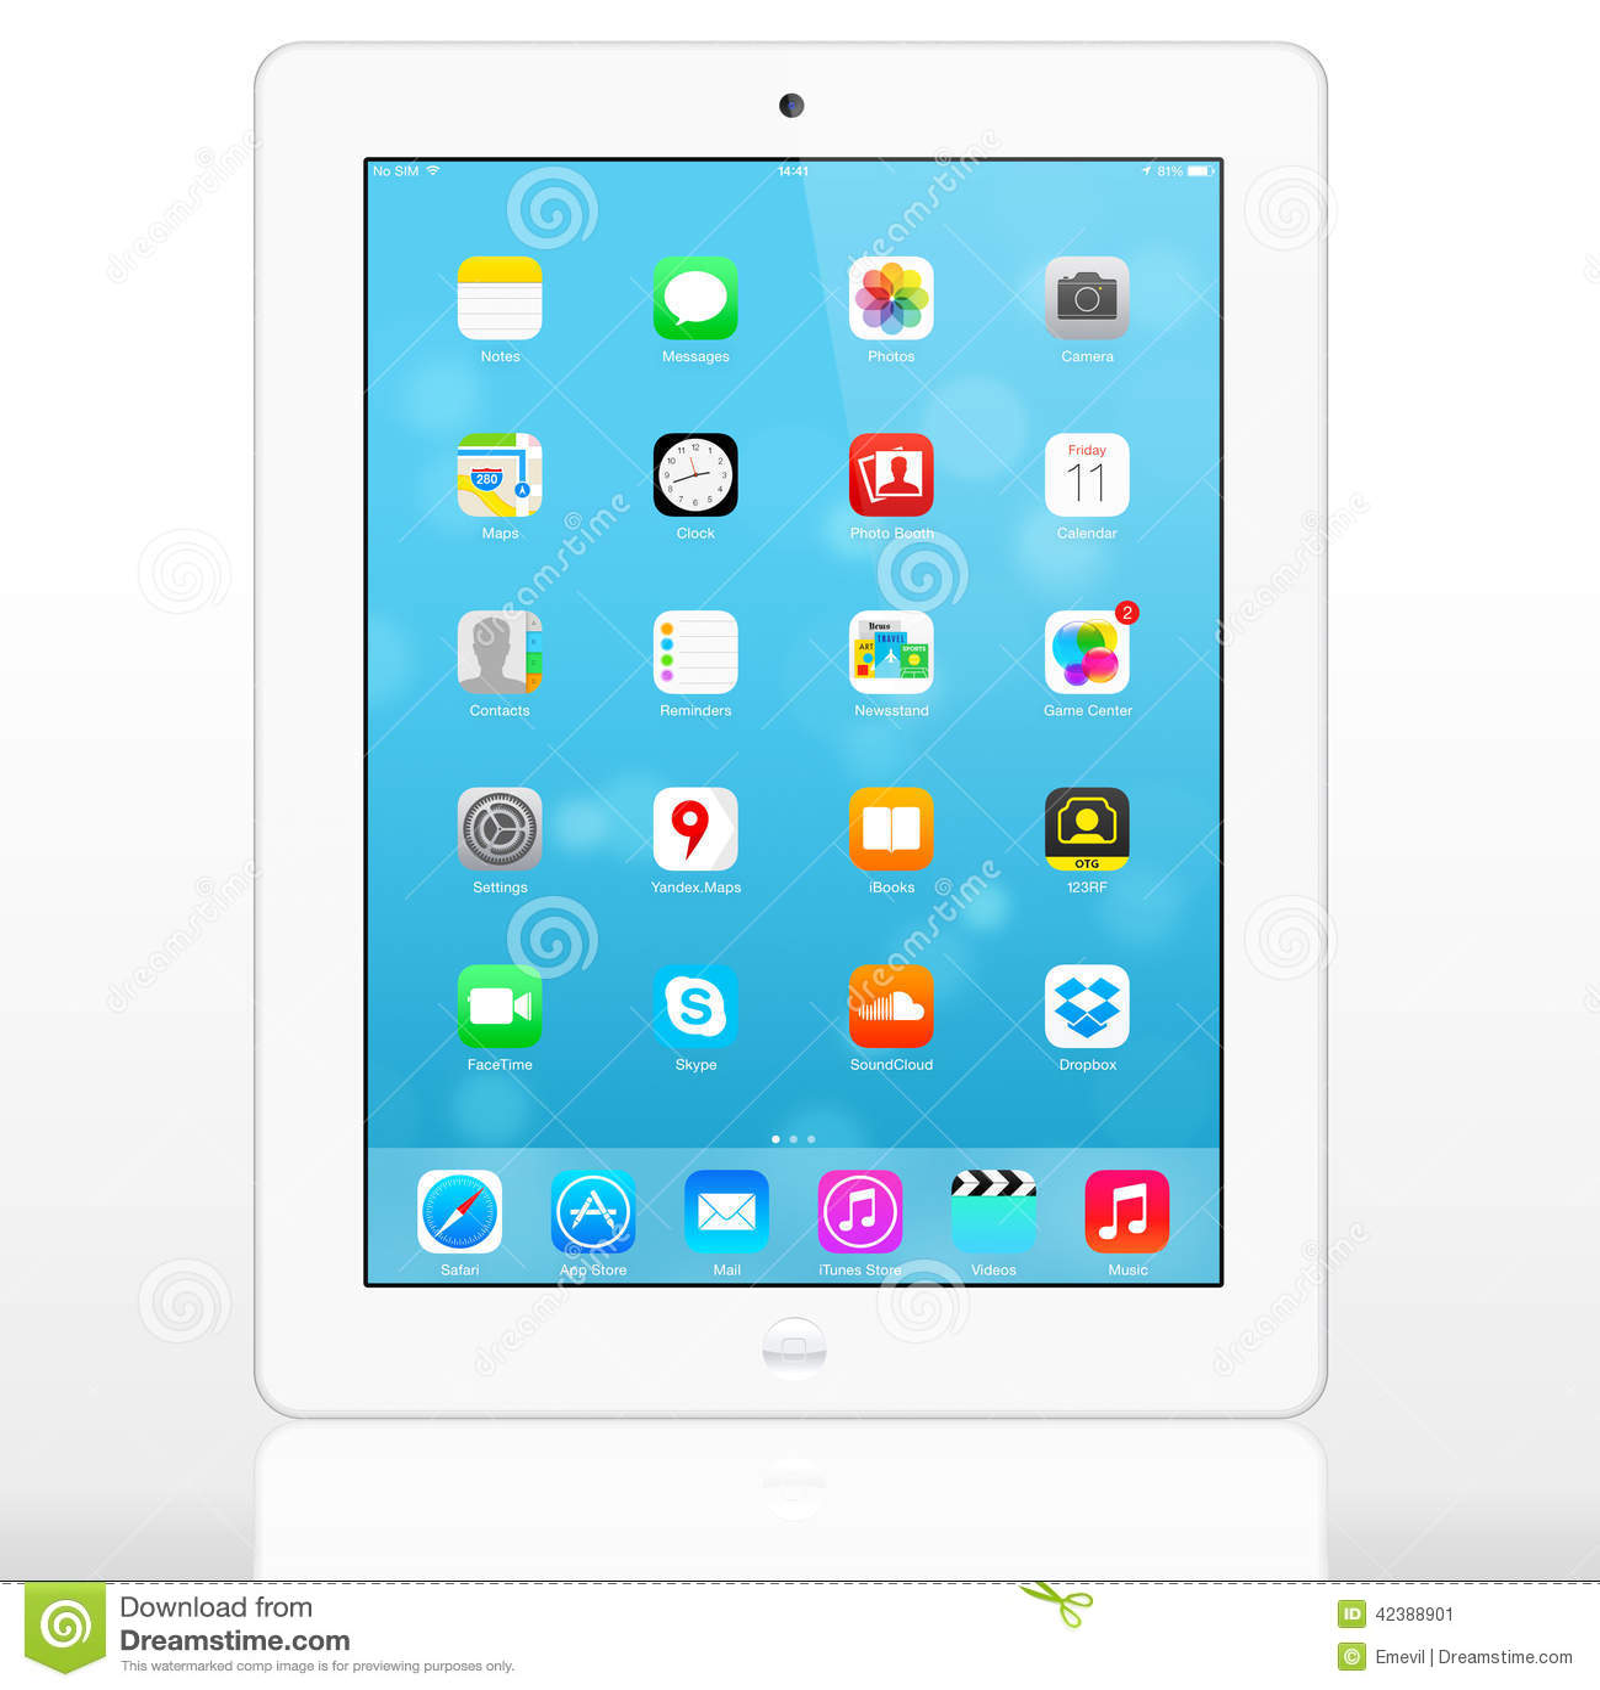 New IOS 7 1 2 Homescreen On An White IPad Display Editorial